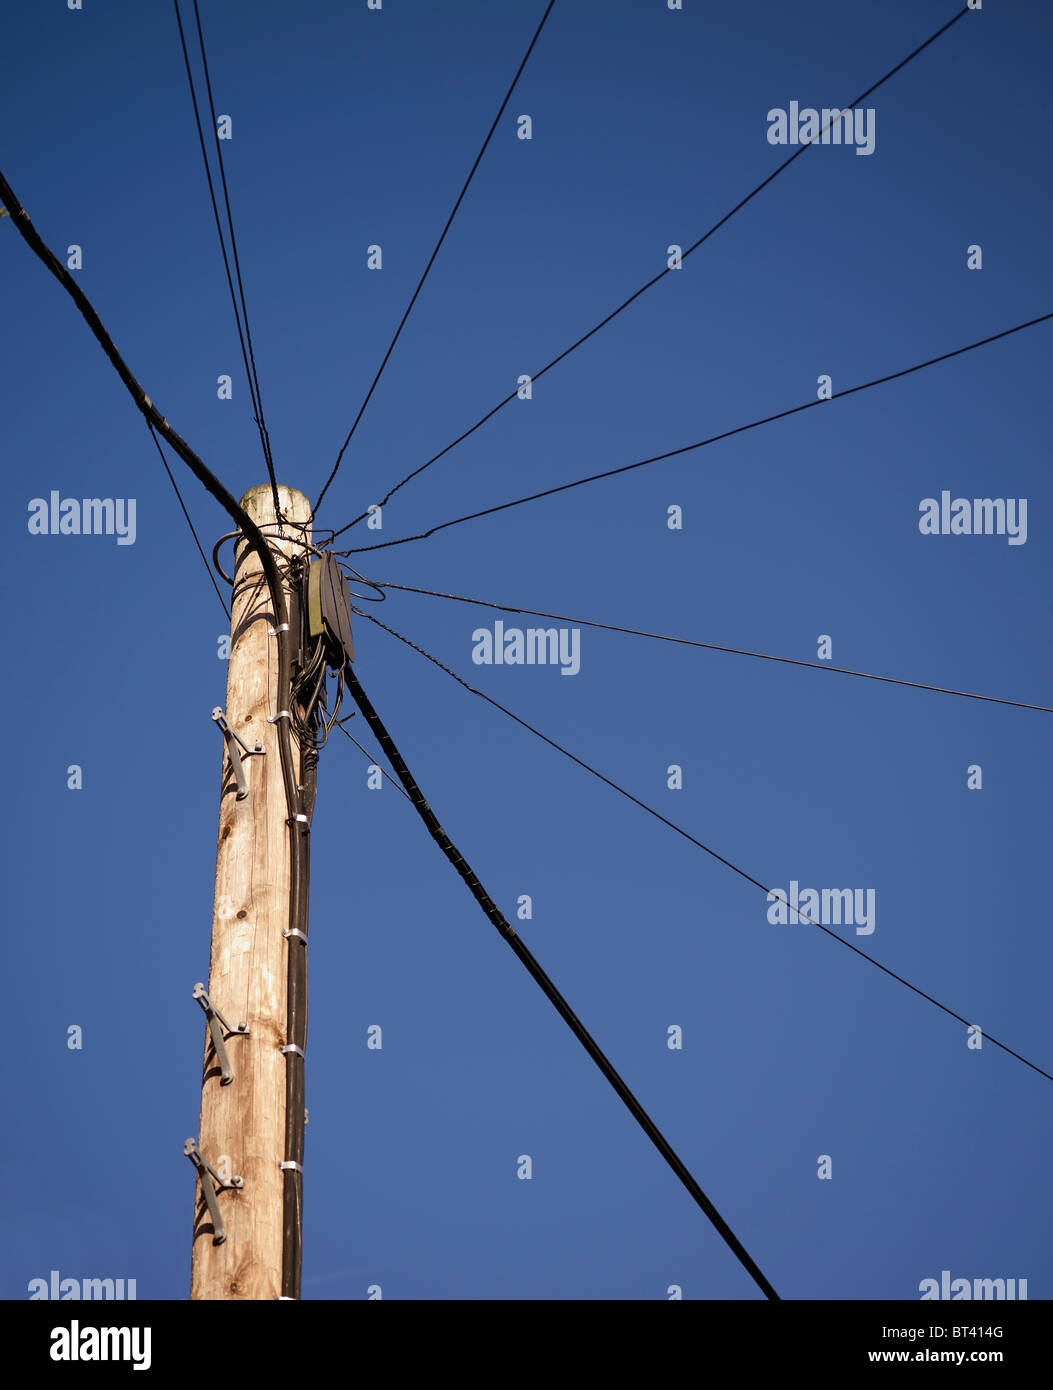 British Telecom Telegraph Pole Used For Overhead Telephone